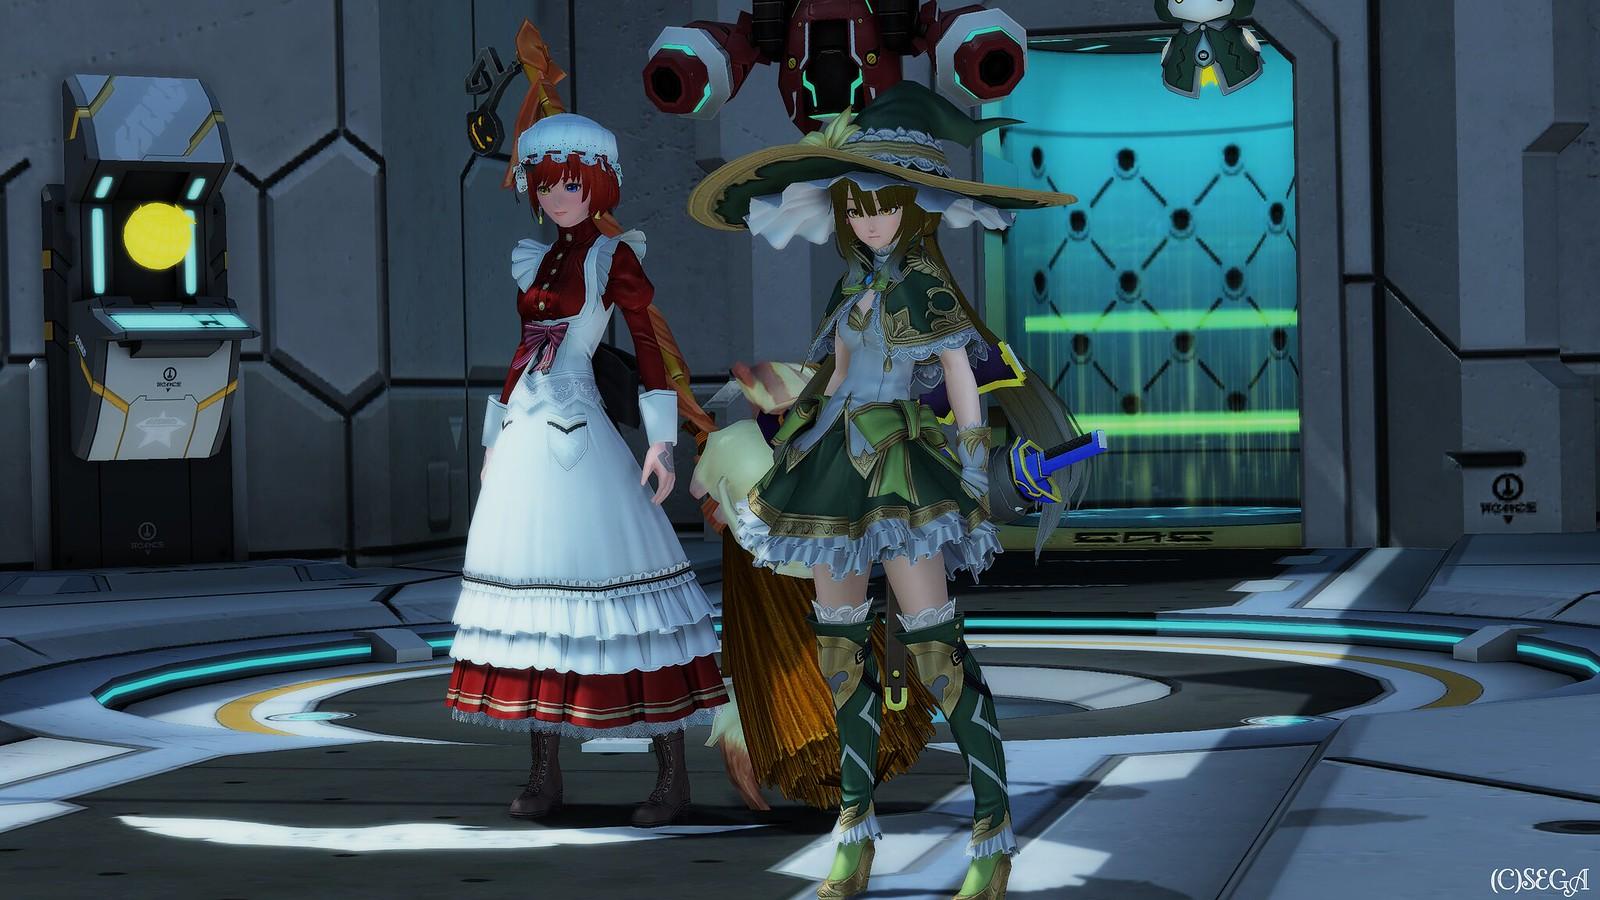 Phantasy Star Online 2 Screenshot 2020.01.26 - 22.53.31.44